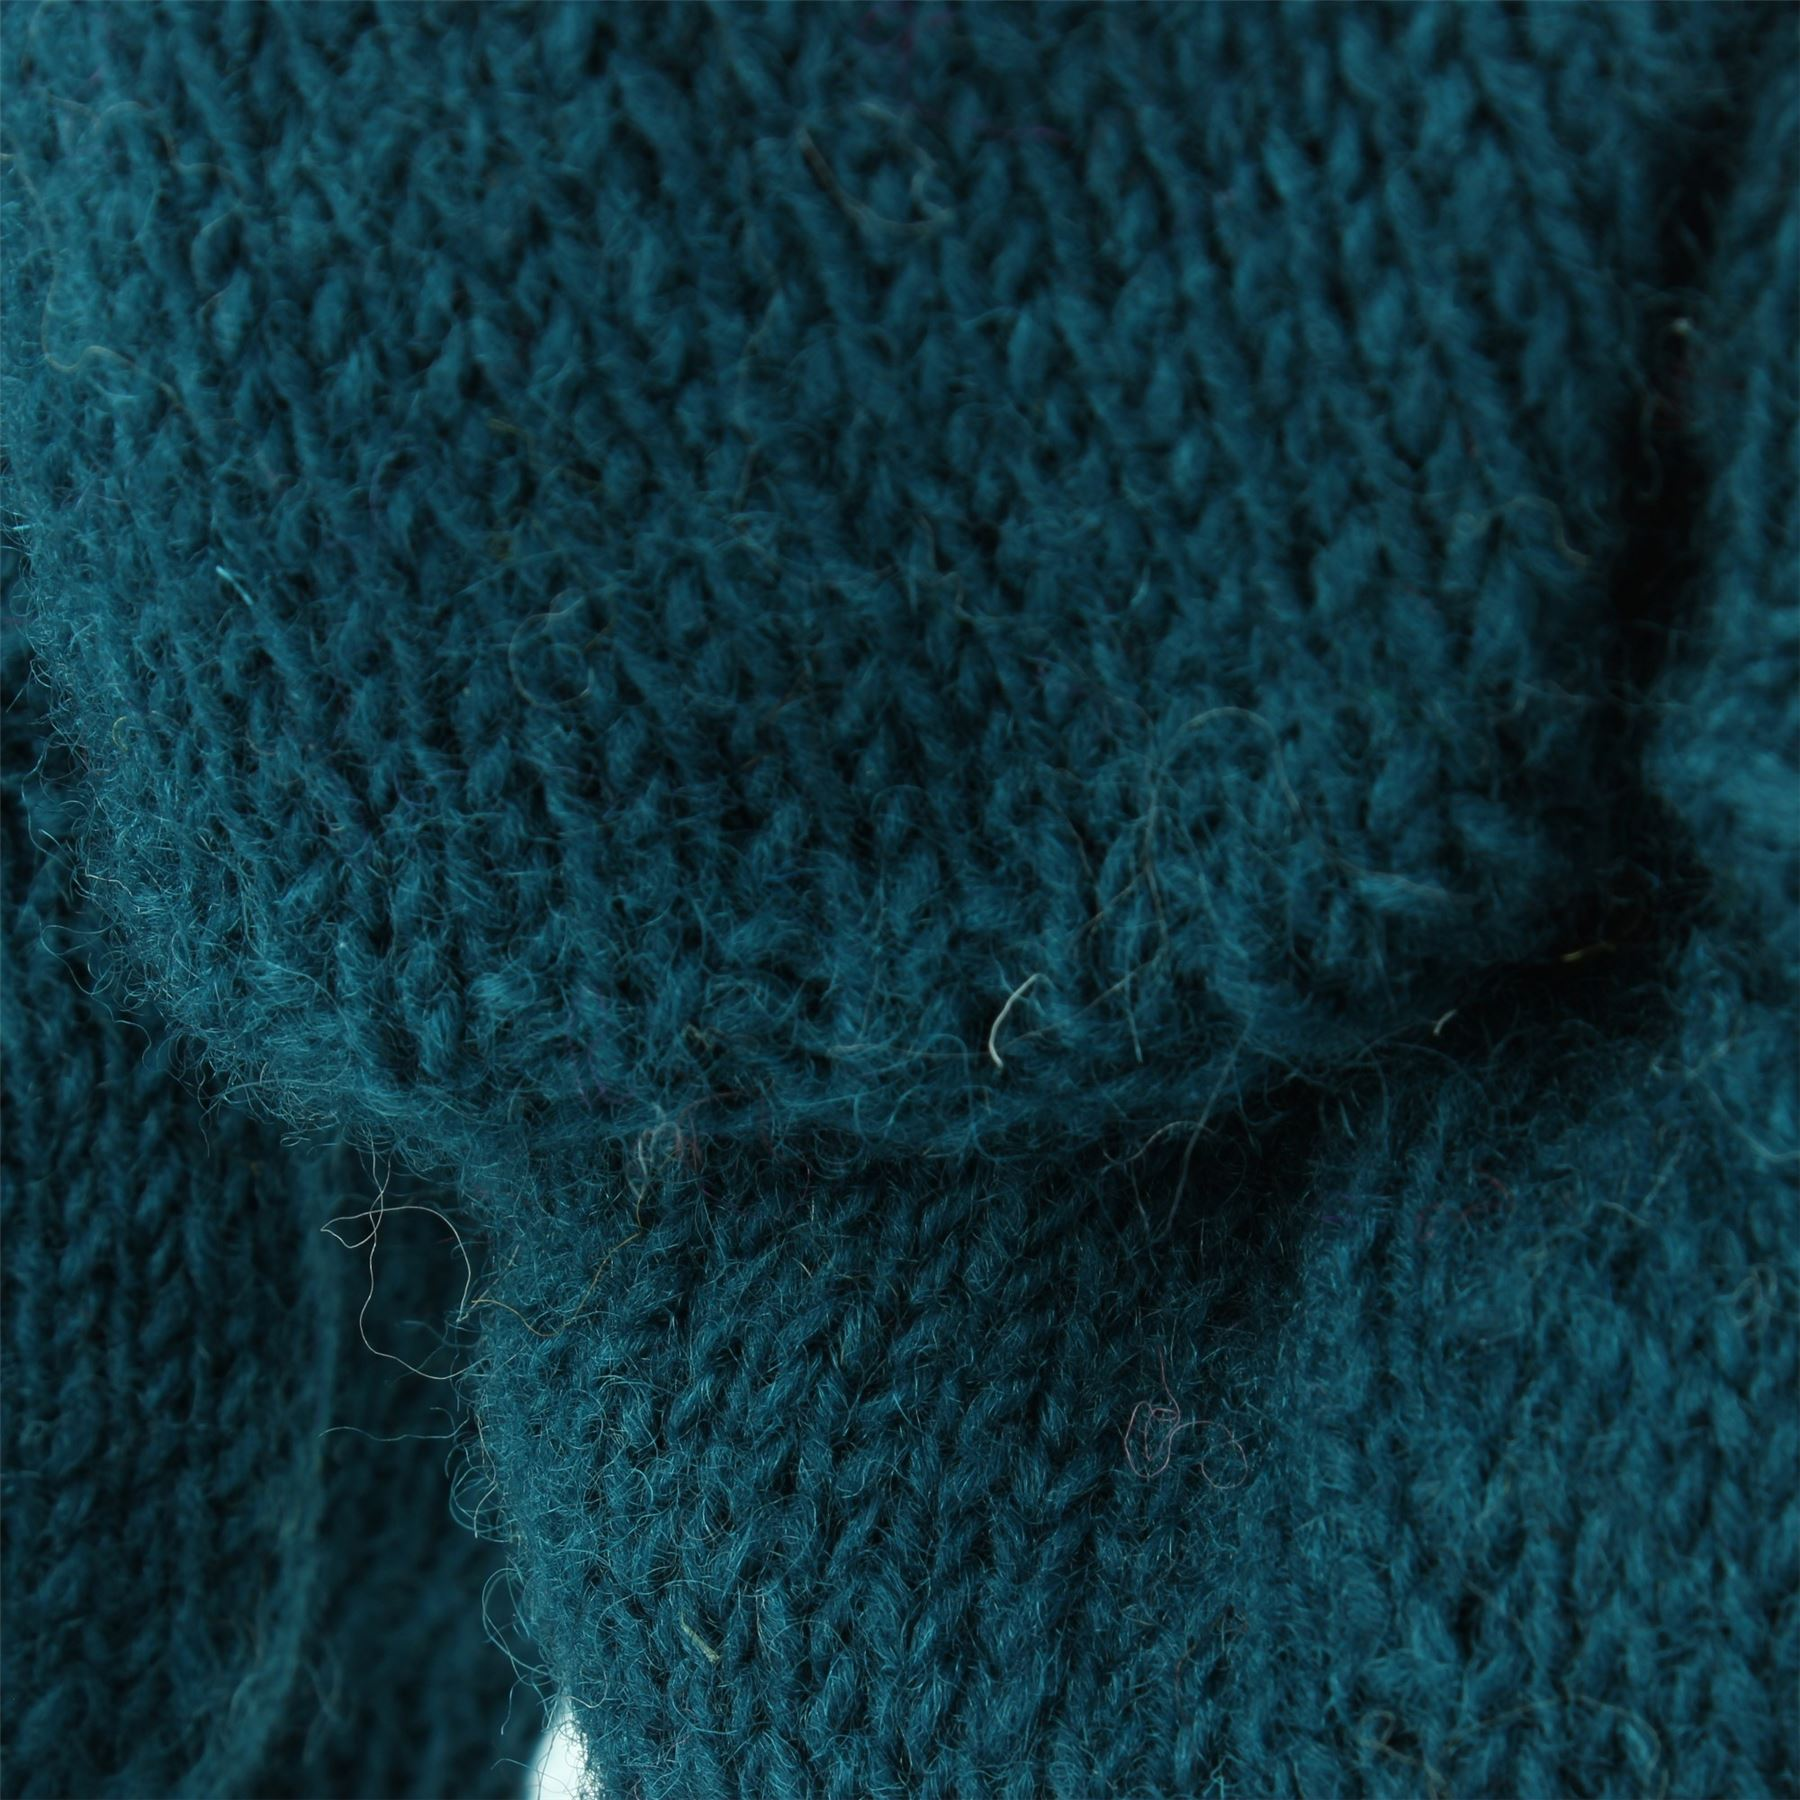 Wool-Gloves-Mittens-Fingerless-Shooter-Lined-PLAIN-Knit-Handmade-LoudElephant